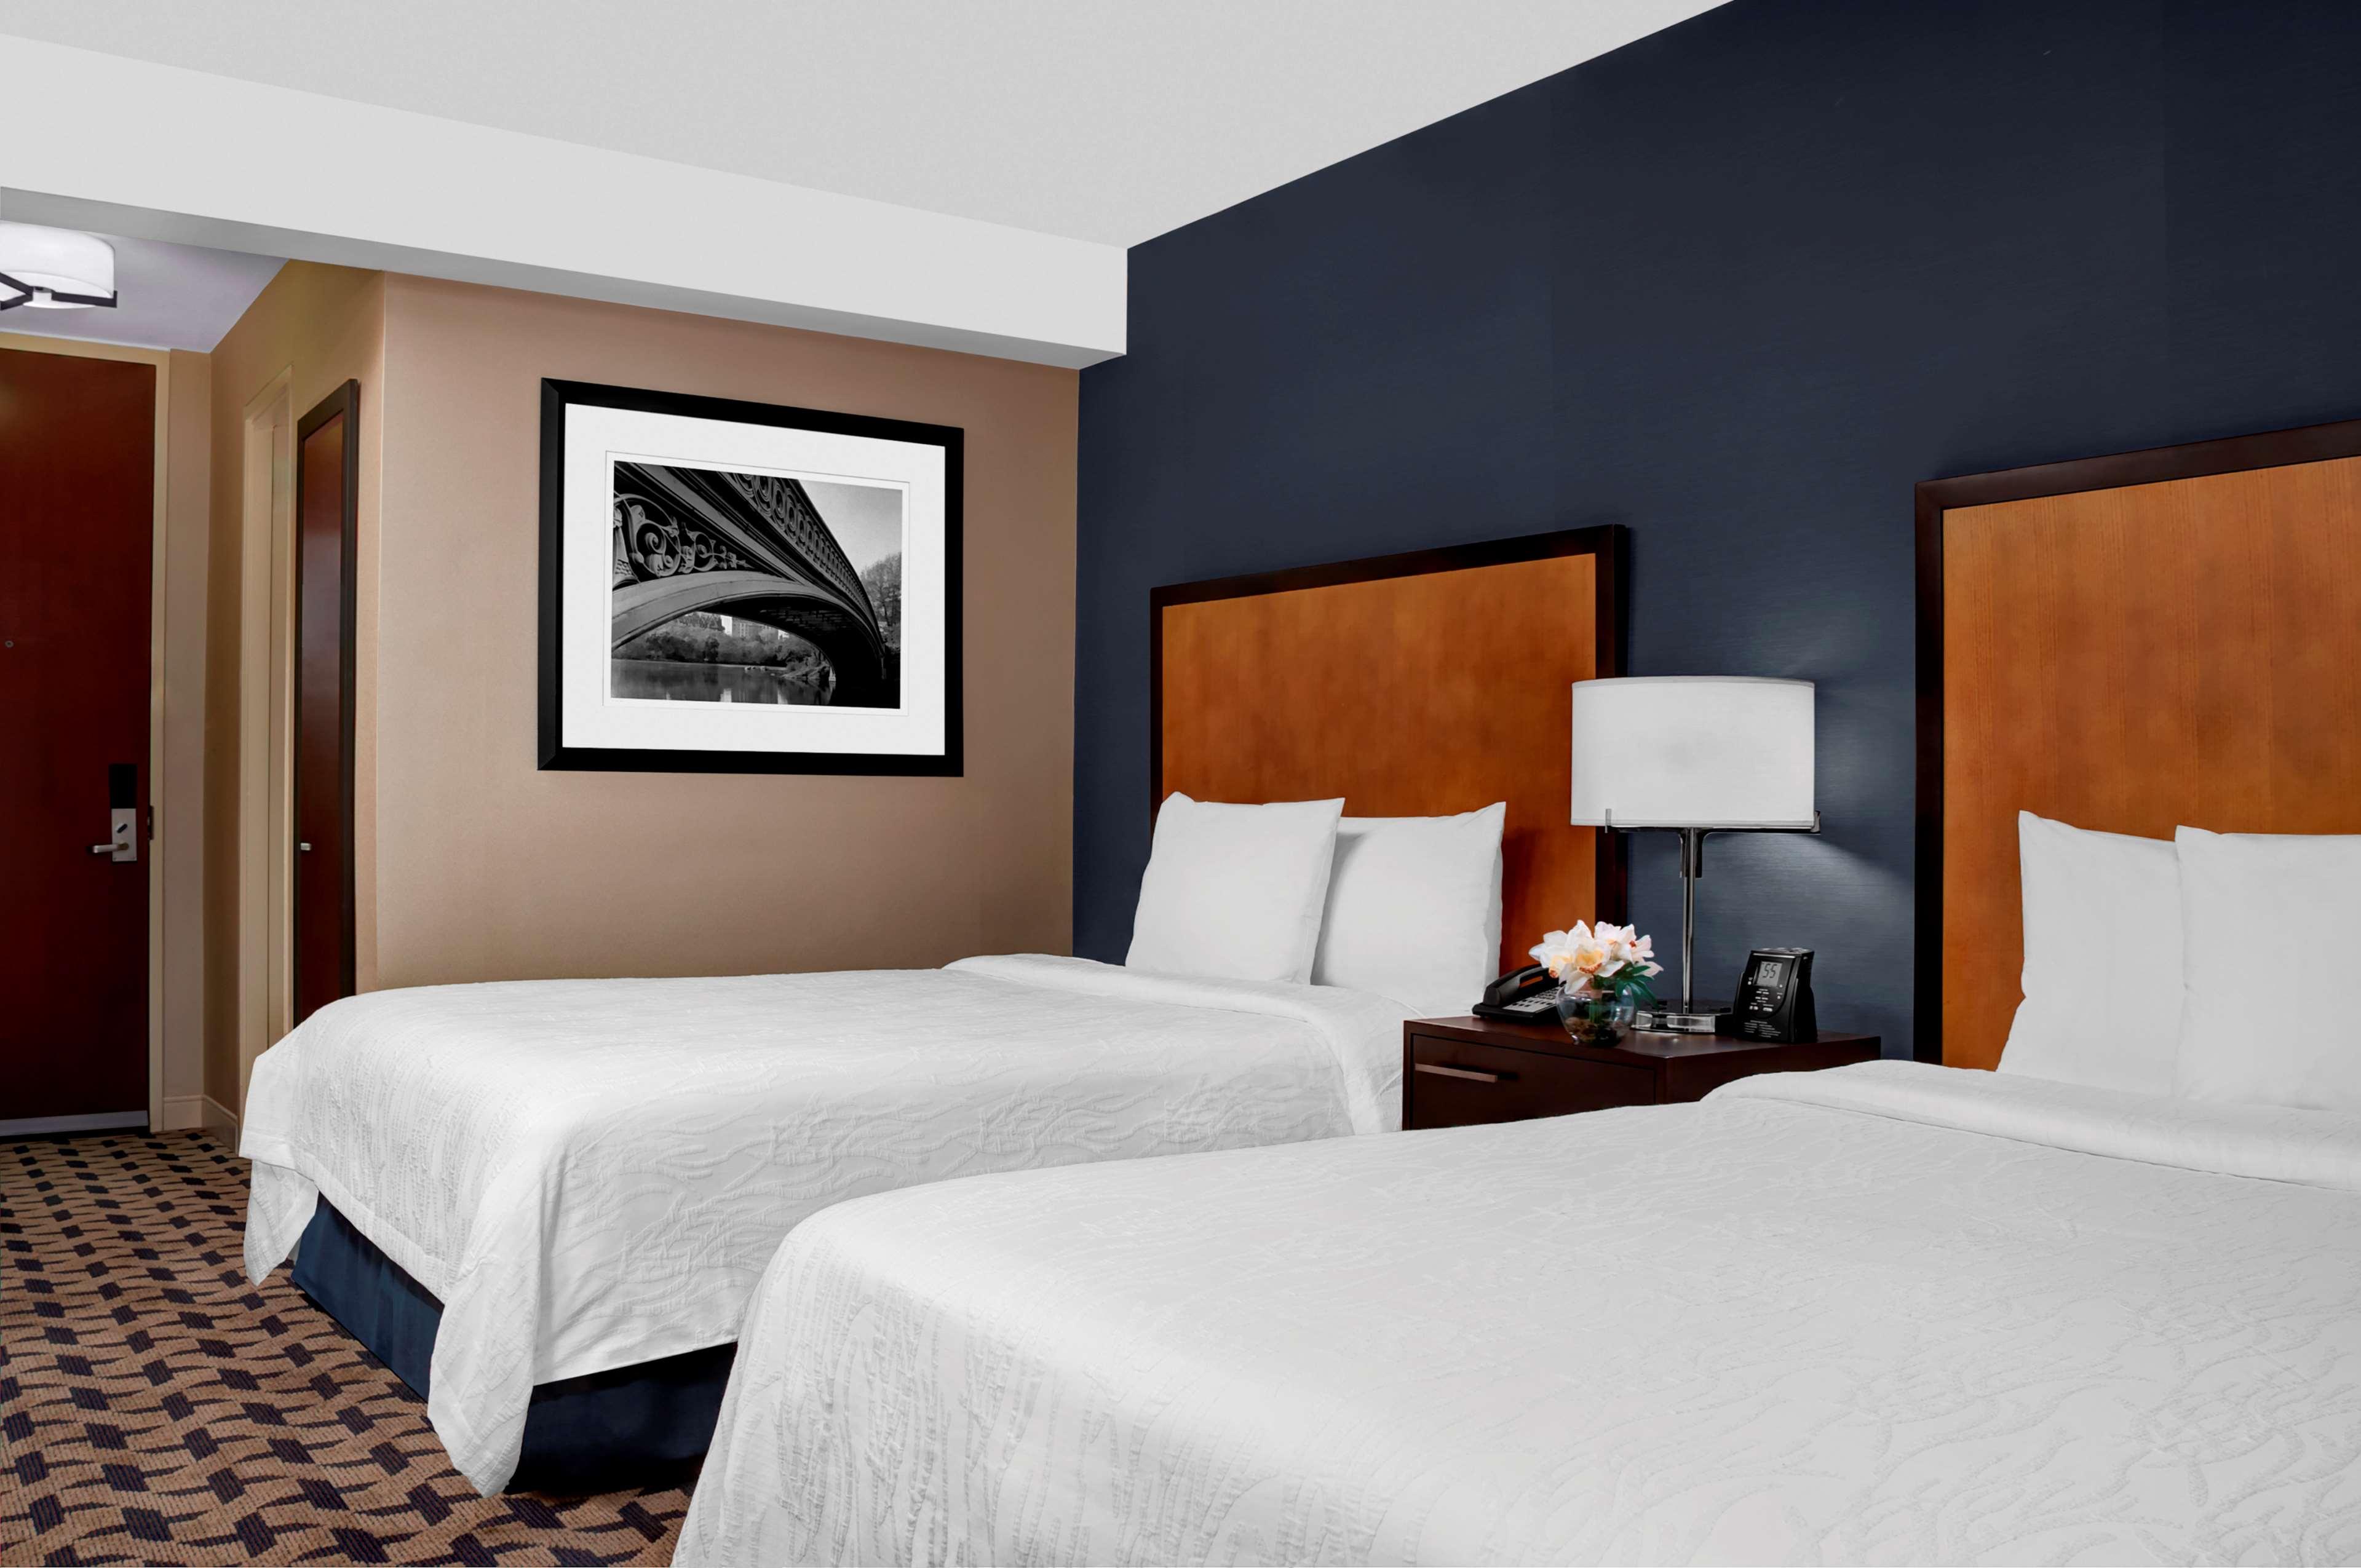 Hilton Garden Inn Times Square image 11